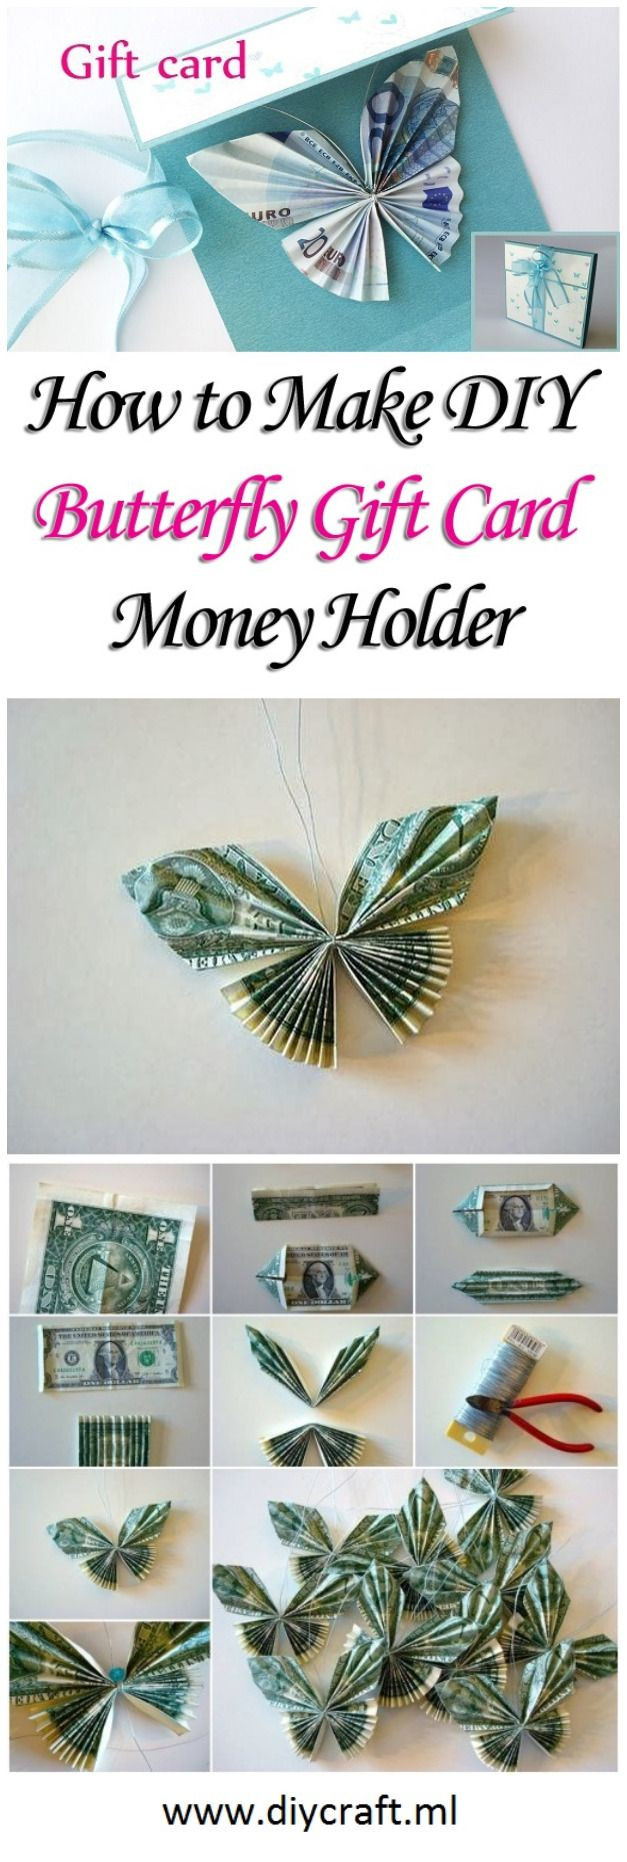 Butterfly Geschenke  Geldgeschenk verpacken Schmetterling falten